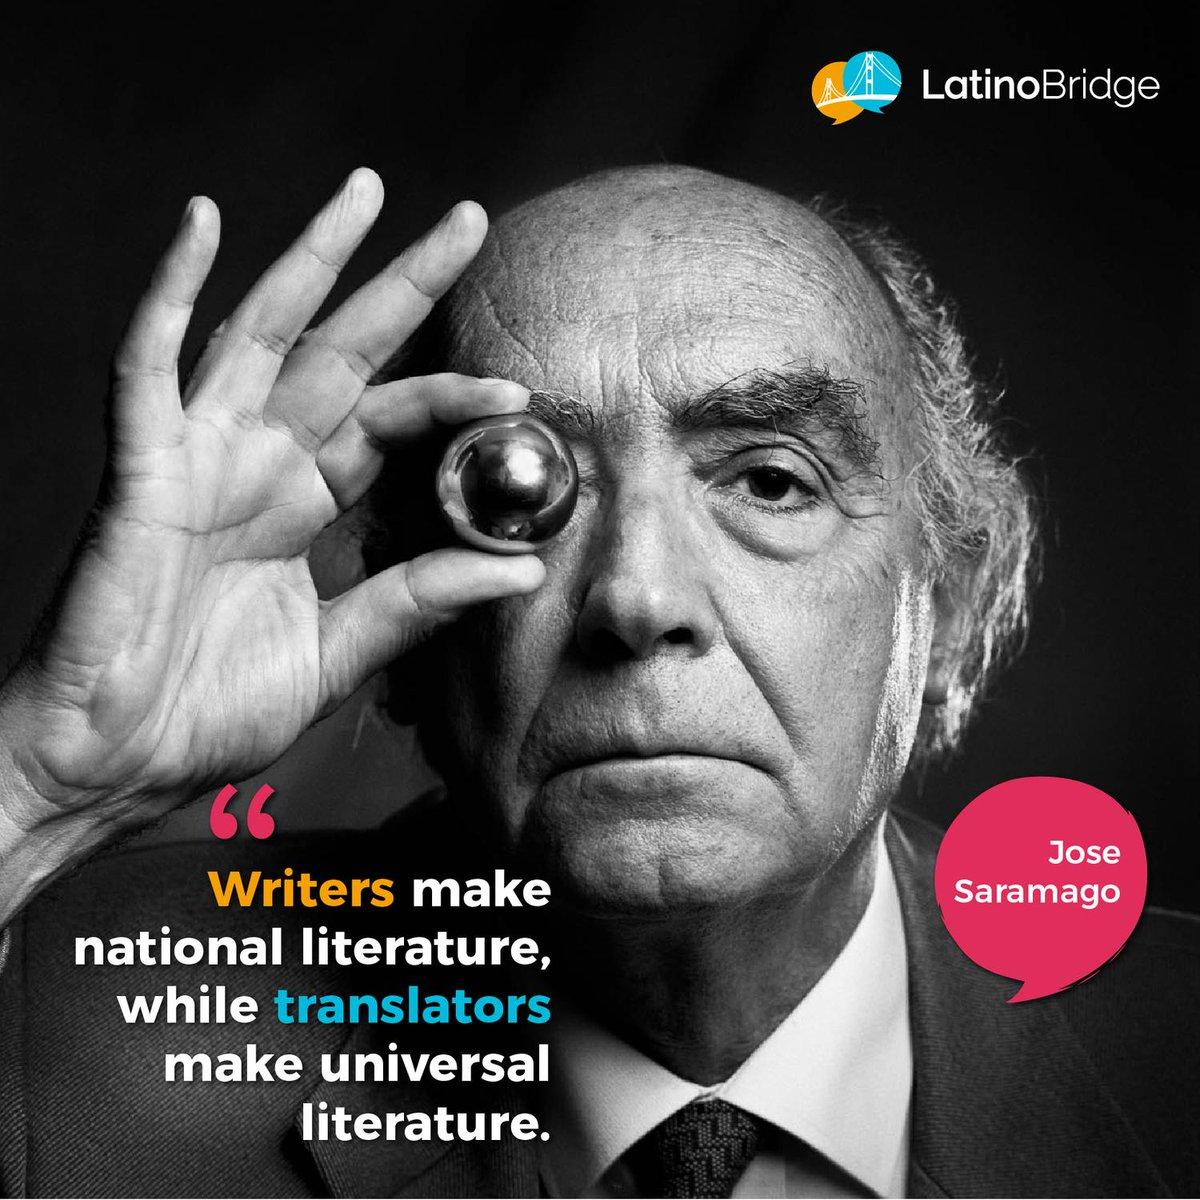 """Writers make national literature, while translators make universal literature""  Jose Saramago #l10n #i18n<br>http://pic.twitter.com/ZCAYJ0Z8I6"